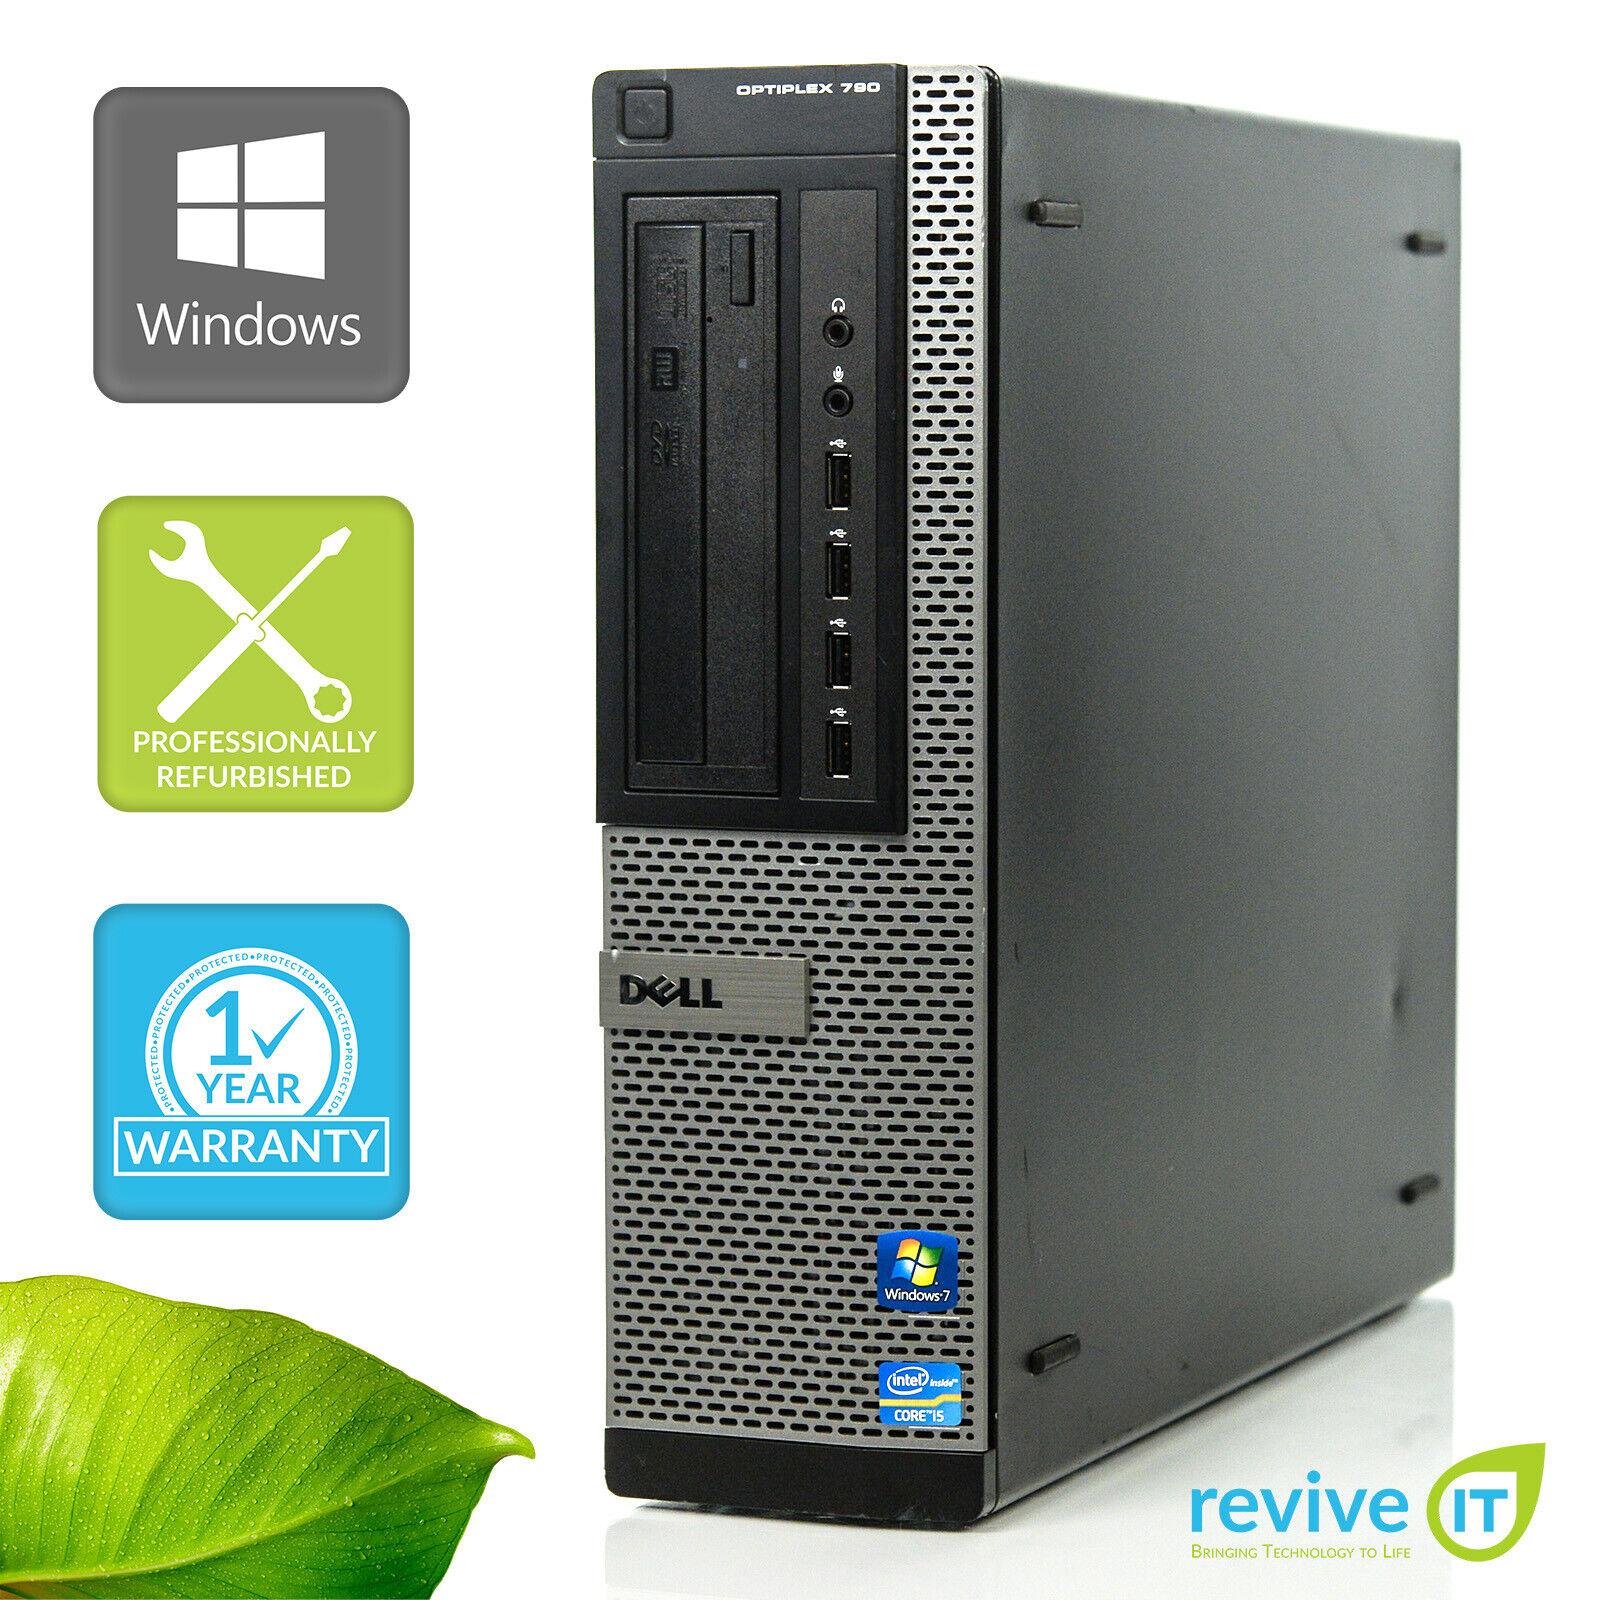 Custom Build Dell Optiplex 790 DT  i5-2400 3.10GHz Desktop Computer PC